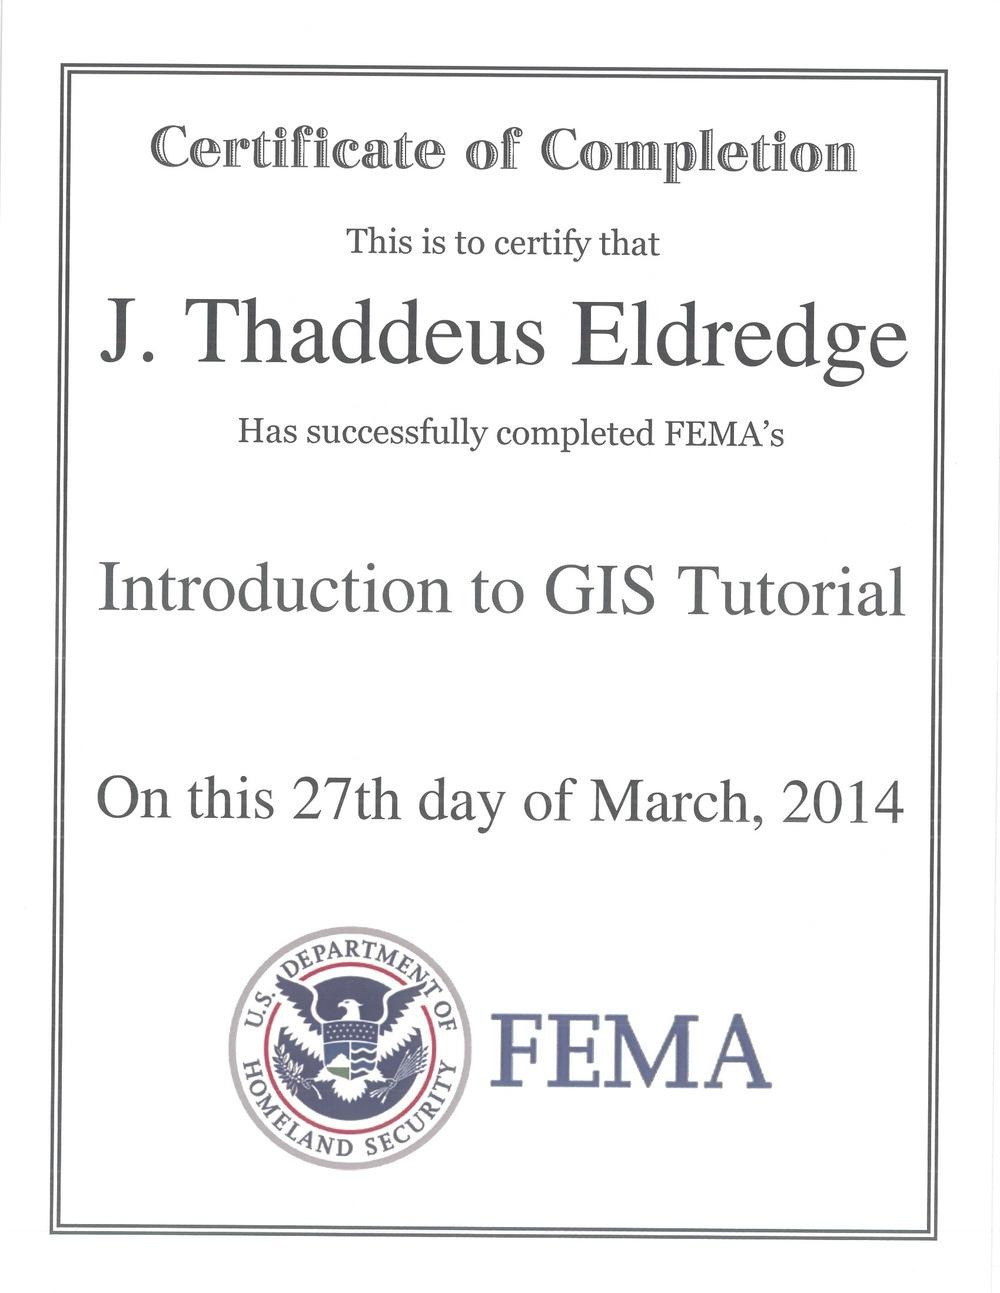 2014-03-27 FEMA GIS INTRO.jpg